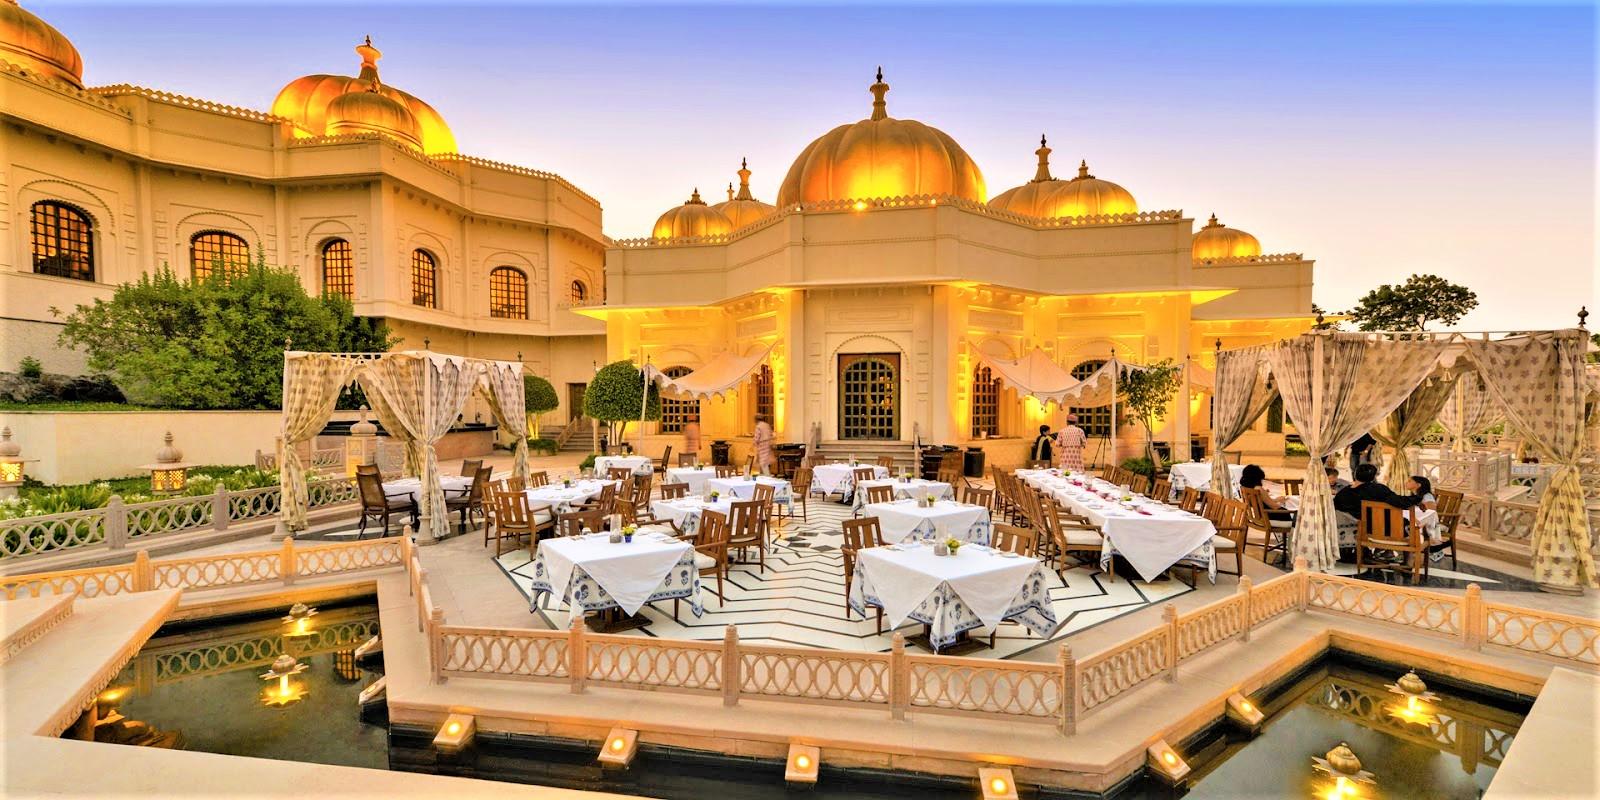 The Lalit Laxmi Vilas Palace Udaipur – Best 5 Star Premier Heritage Hotel in Udaipur